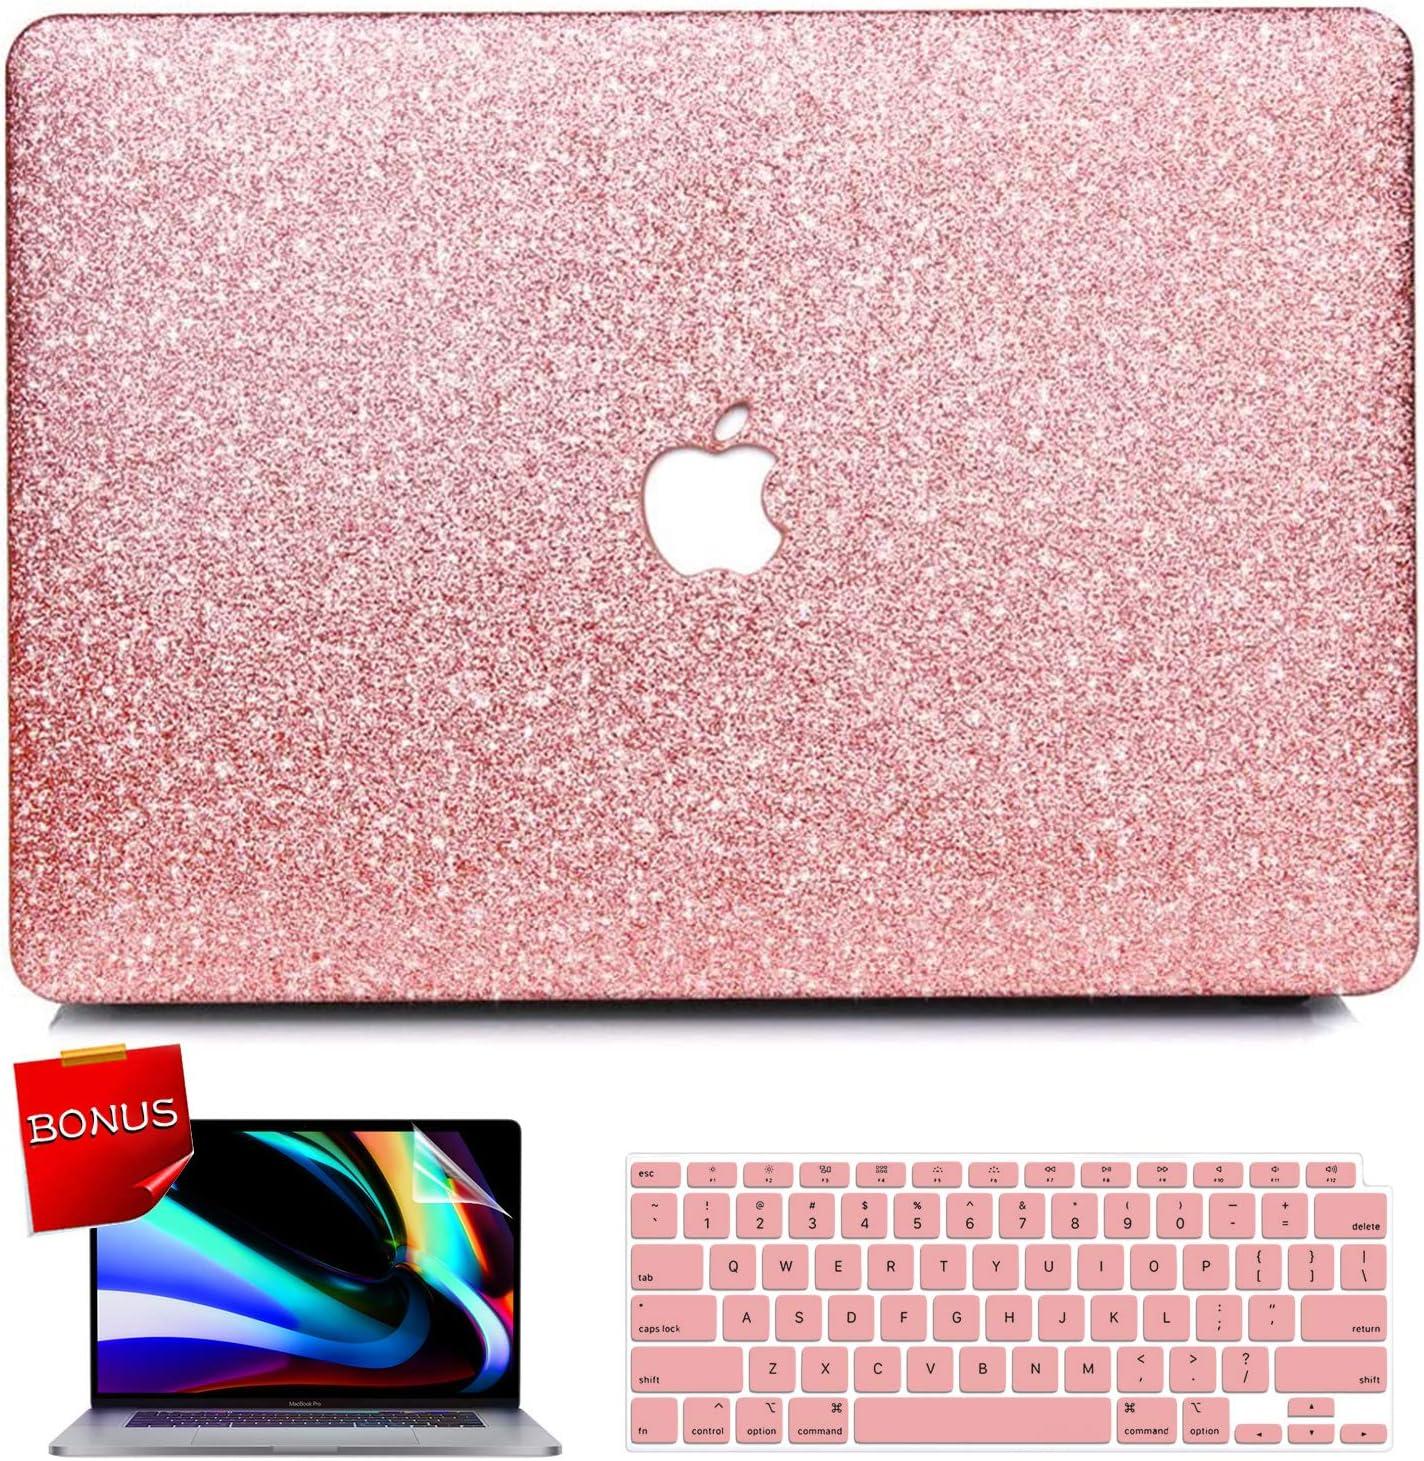 Macbook Air 13 2020 2019 Screen Protector Hard Shell Case Accessories Set A2337 M1 A1932 A2179 Keyboard Cover MacBook Air 13 Case